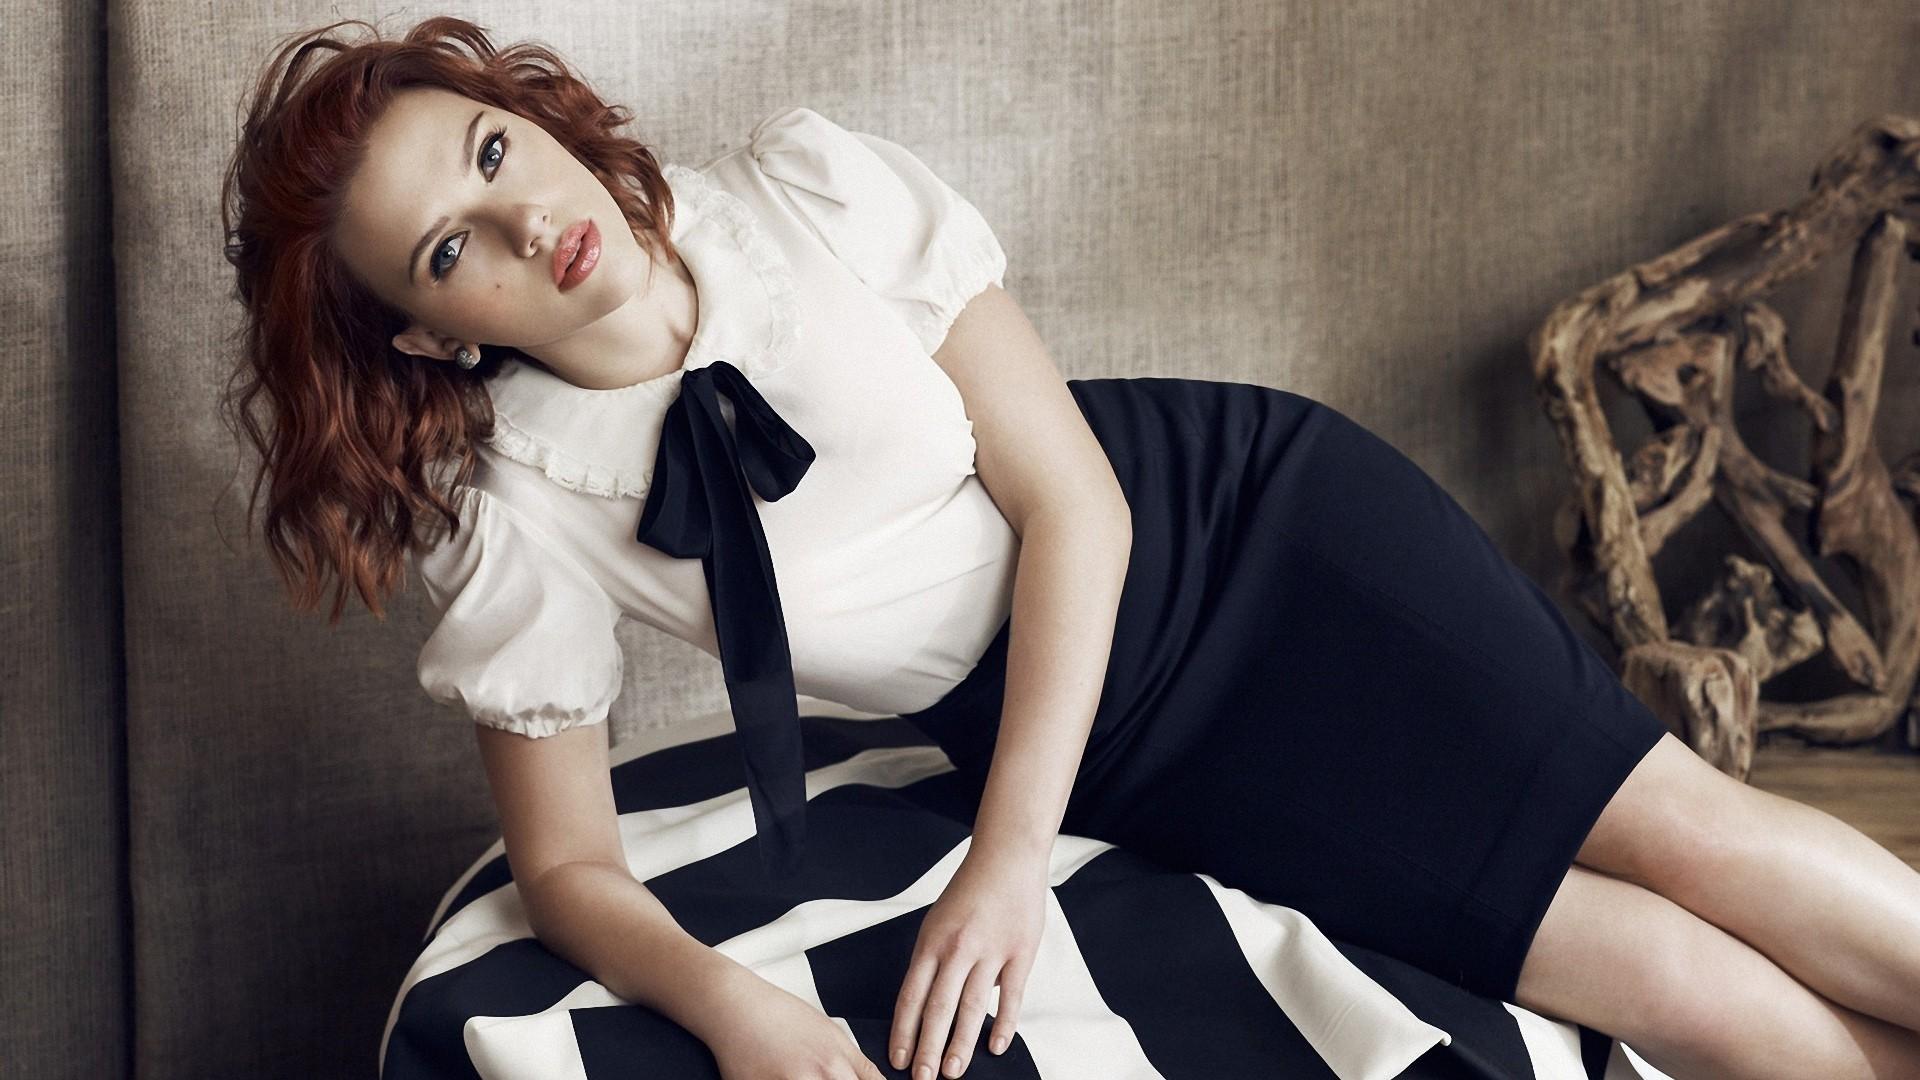 Scarlett Johansson Download Wallpaper